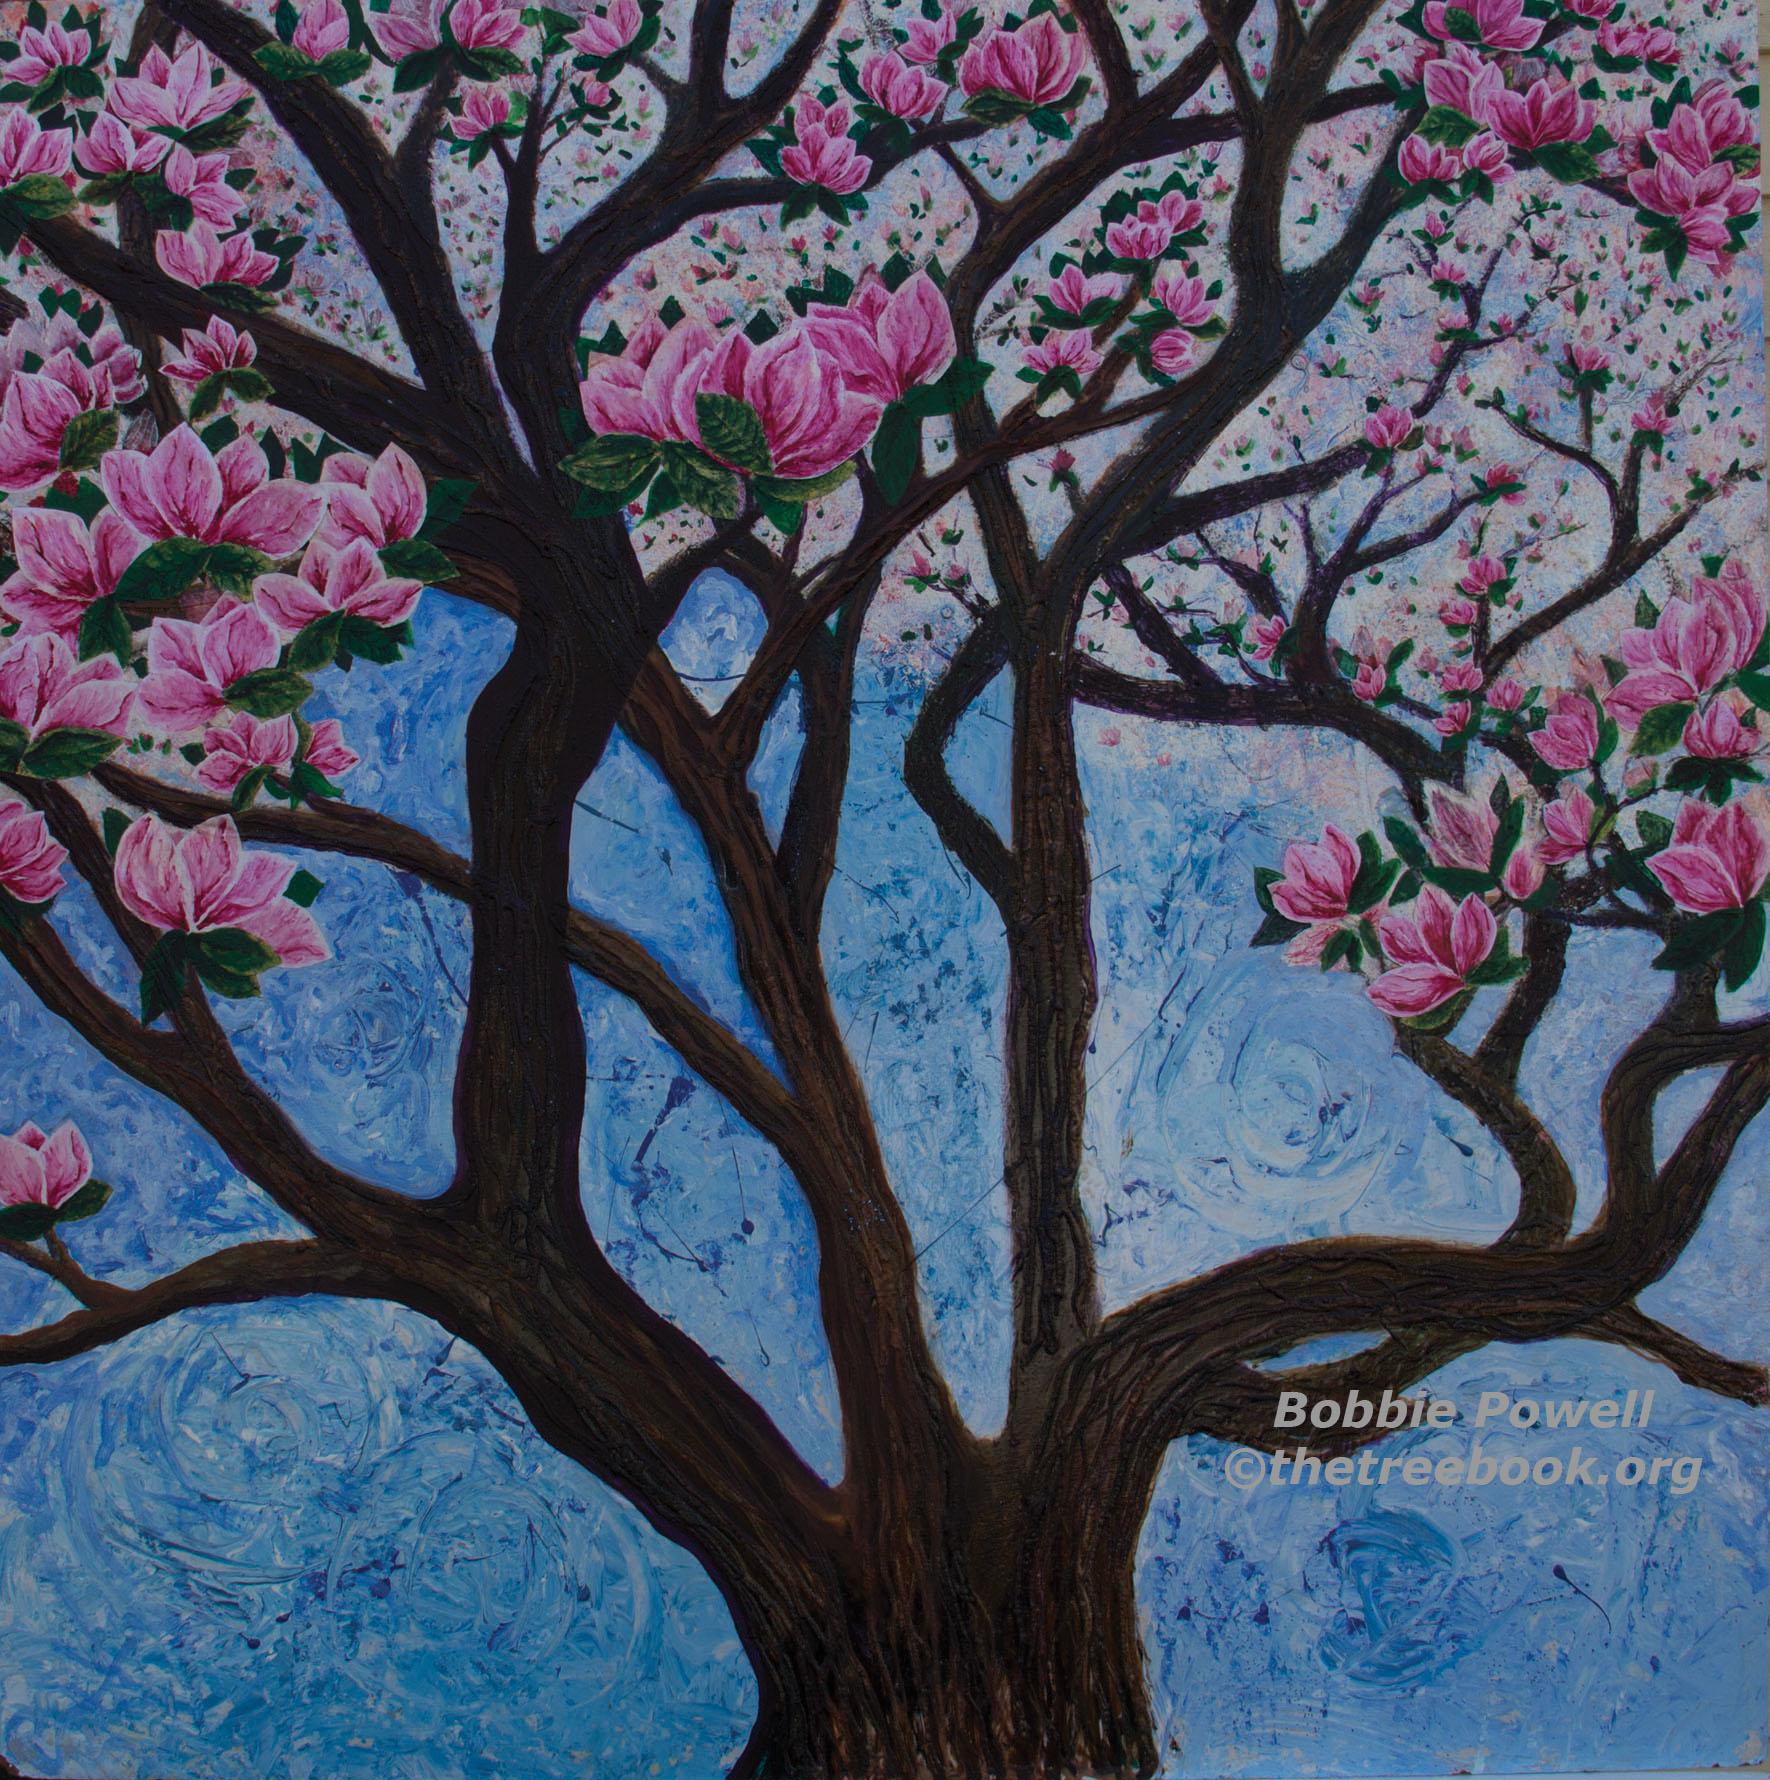 Bobbie Powell, Magnolia